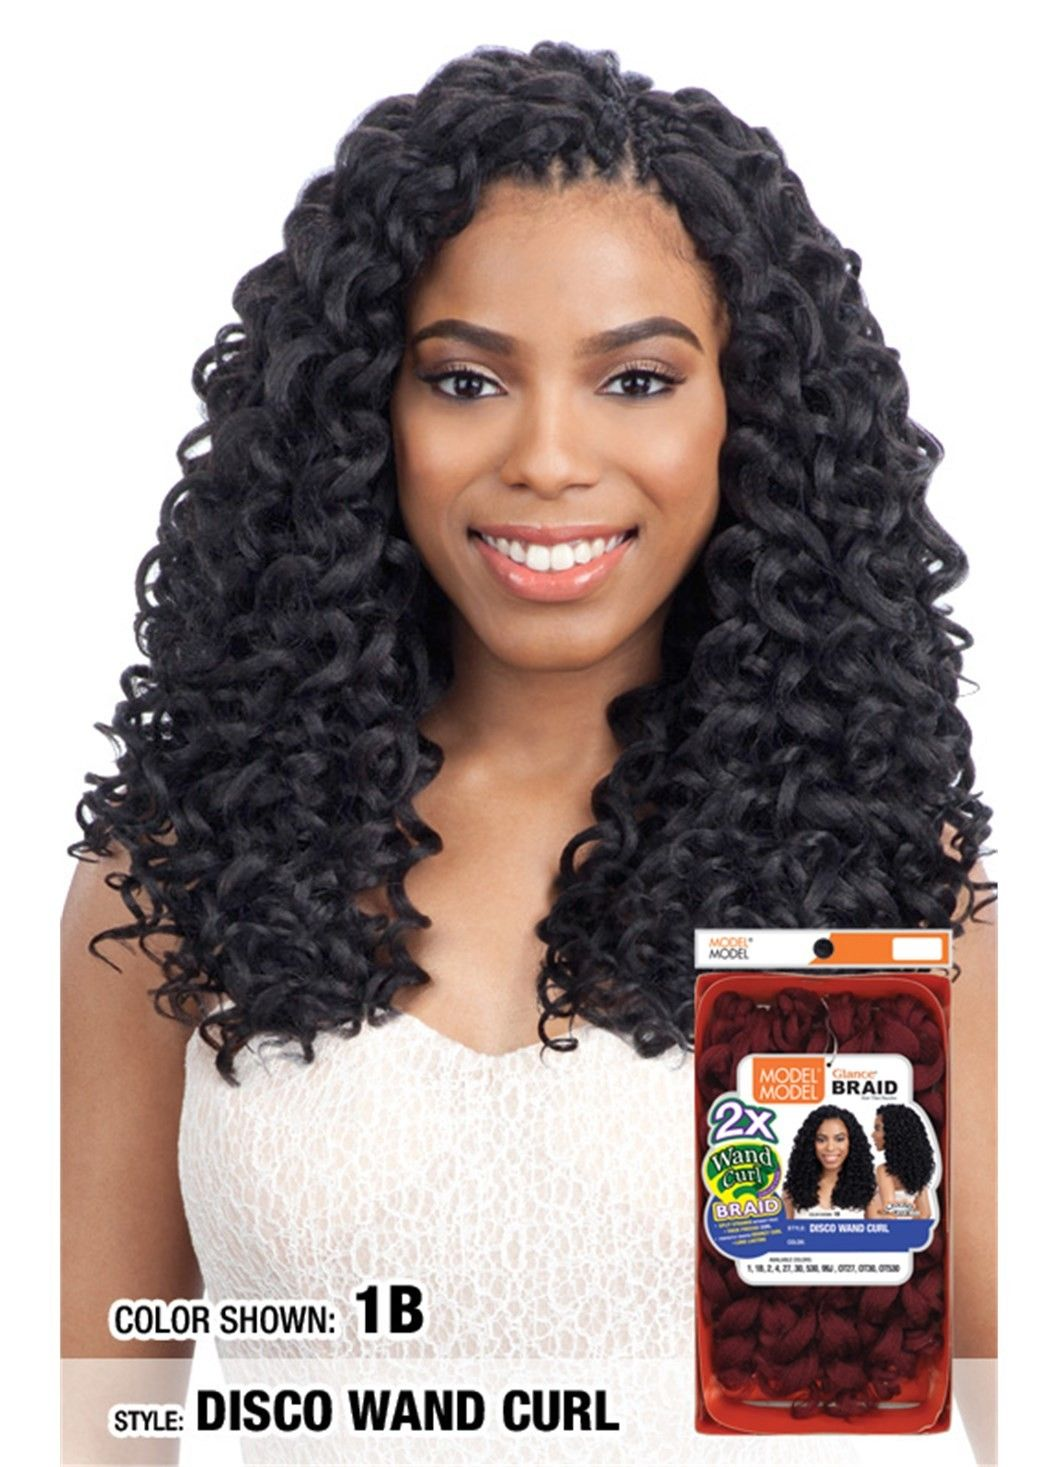 Model Model Glance Braid 2X DISCO WAND CURL Wand curls